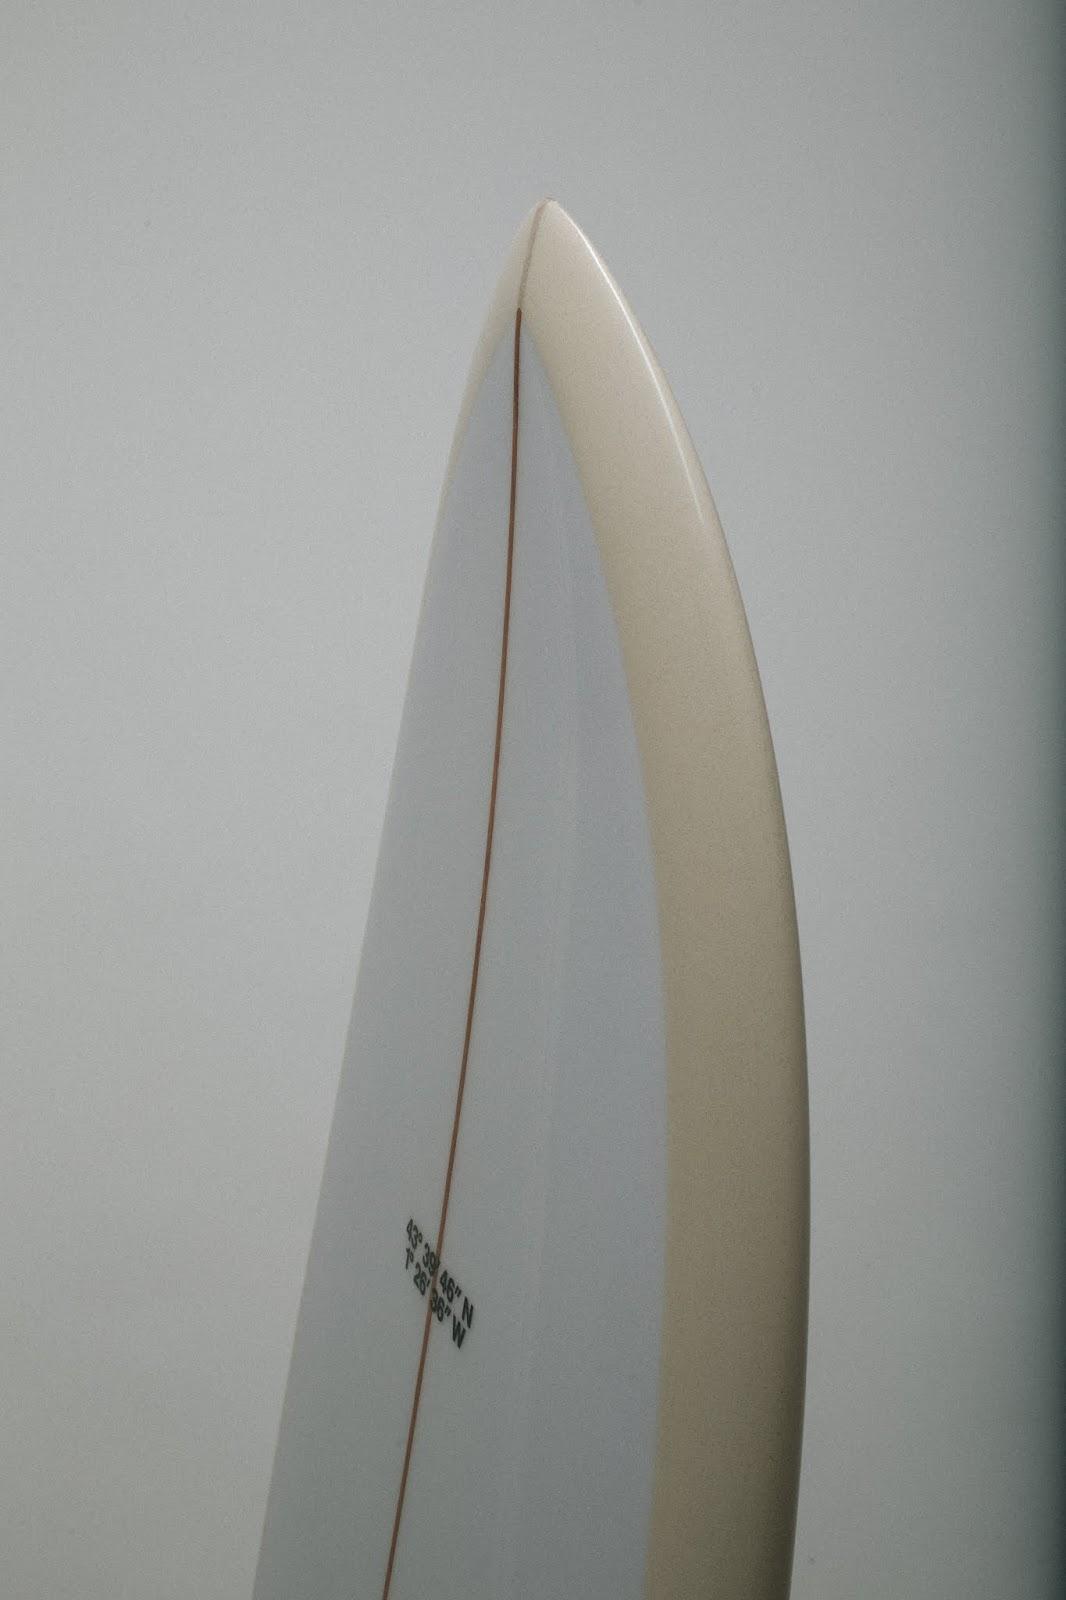 surfinestate surf Hossegor France gains board twin fin stevelis Arthur Nelli Vincent Lemanceau shape shaper handshape trueames stussy sdouble blendglassing usblanks